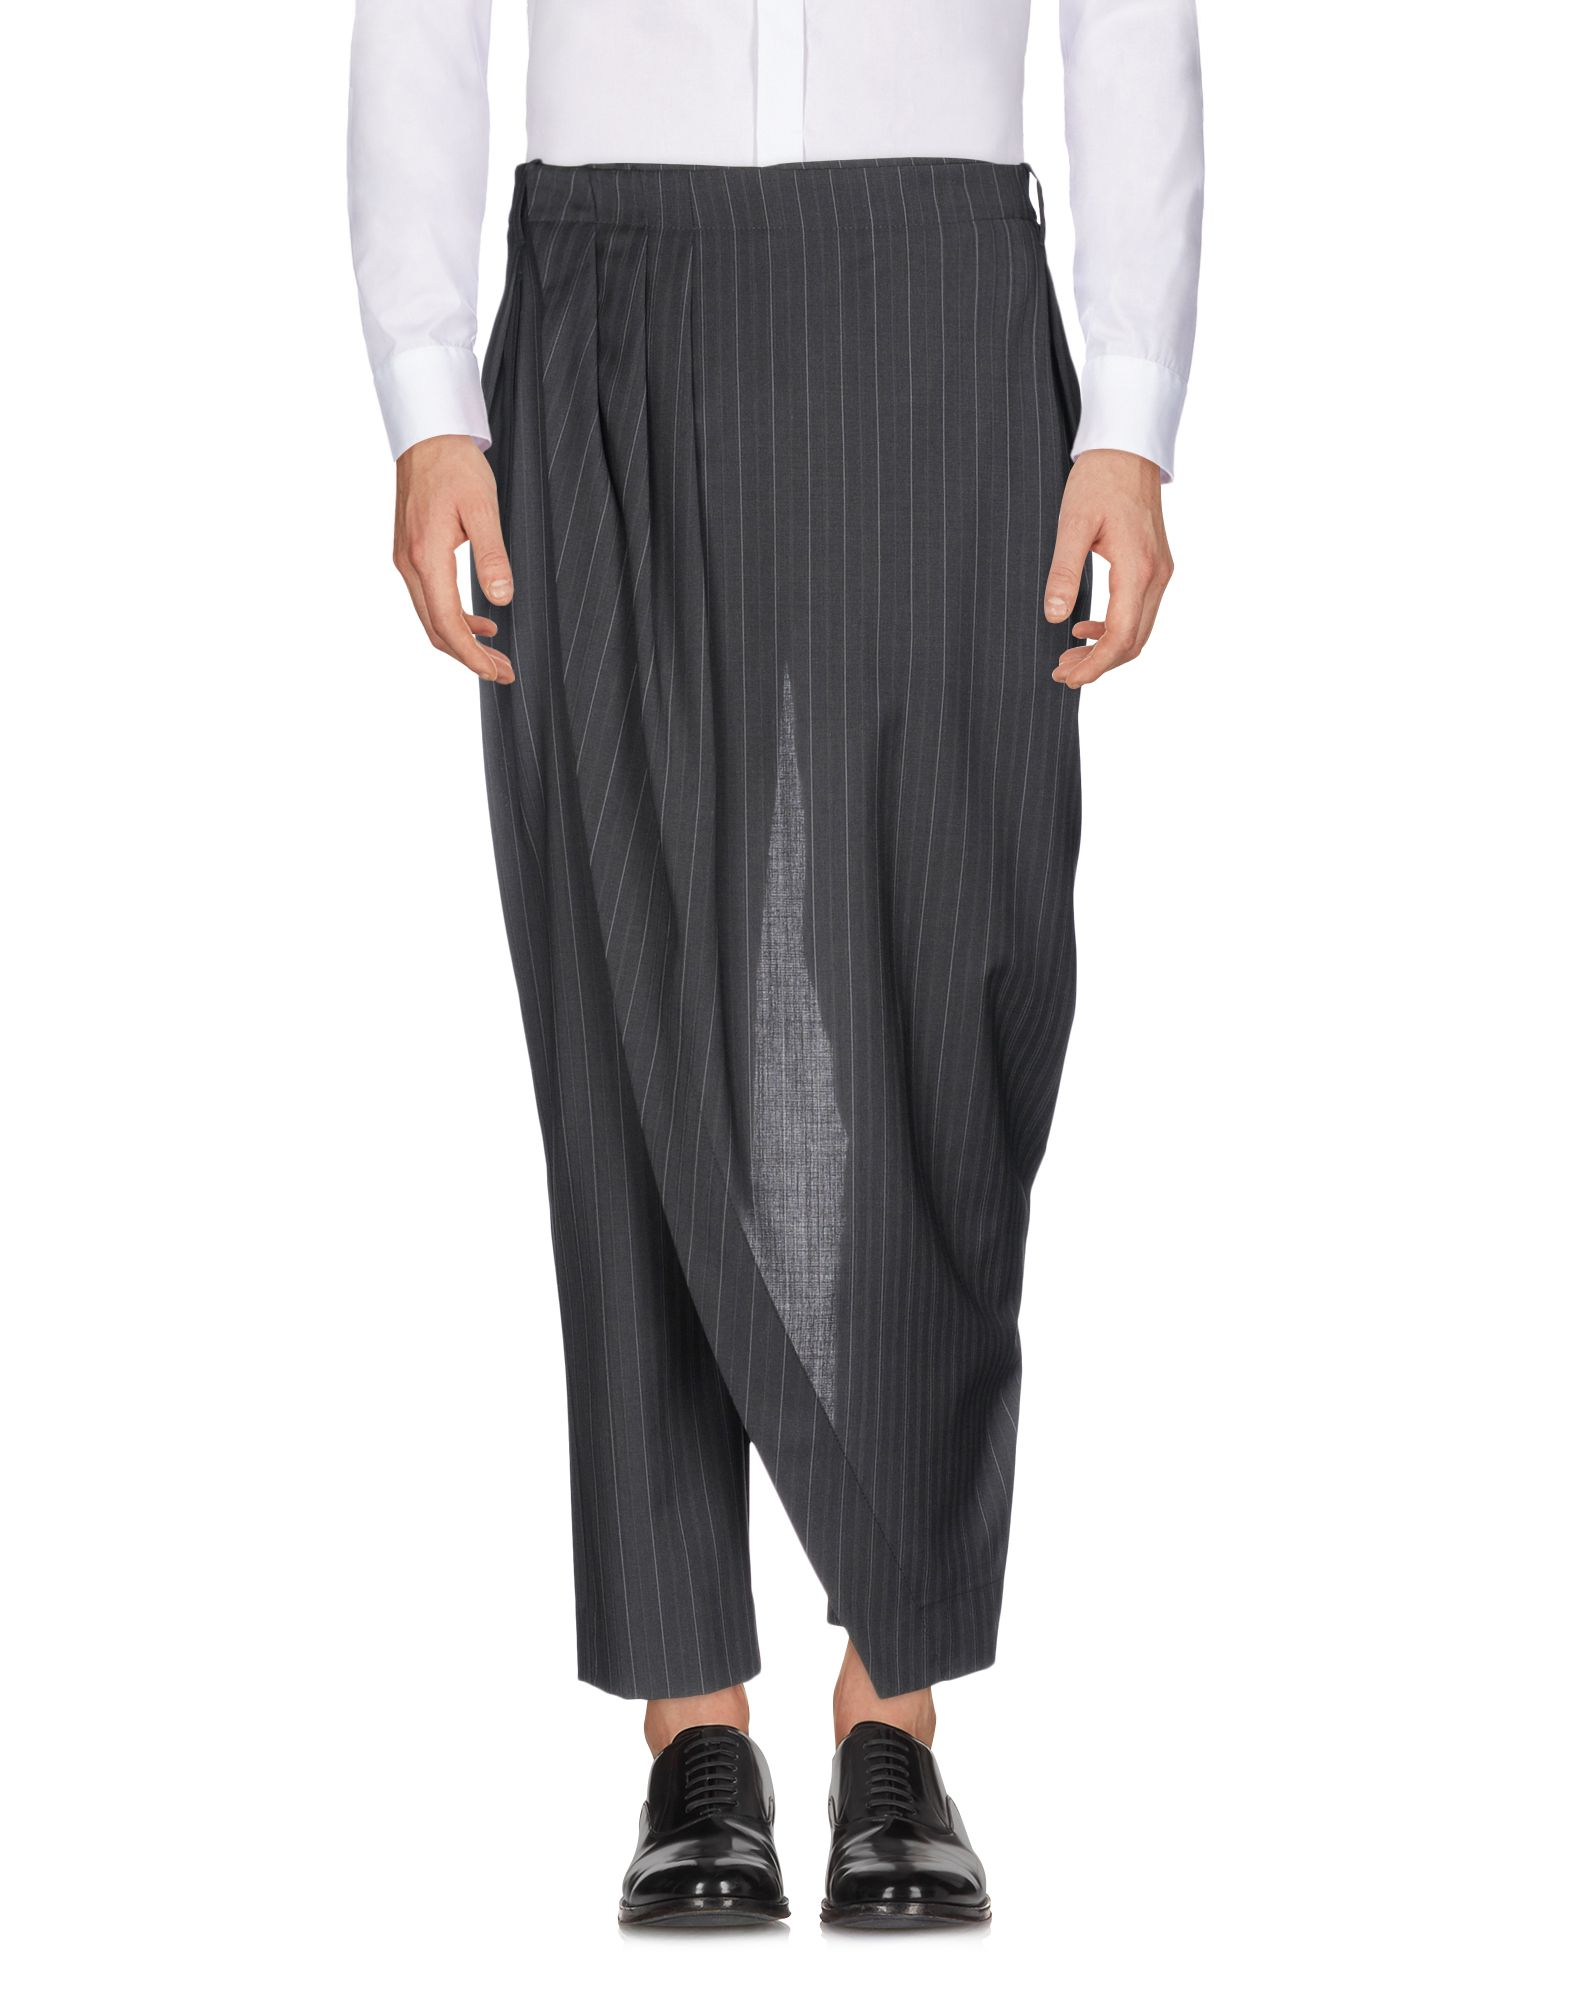 Pantalone Tom Rebl Uomo - 13141752XR 13141752XR - 200bd5